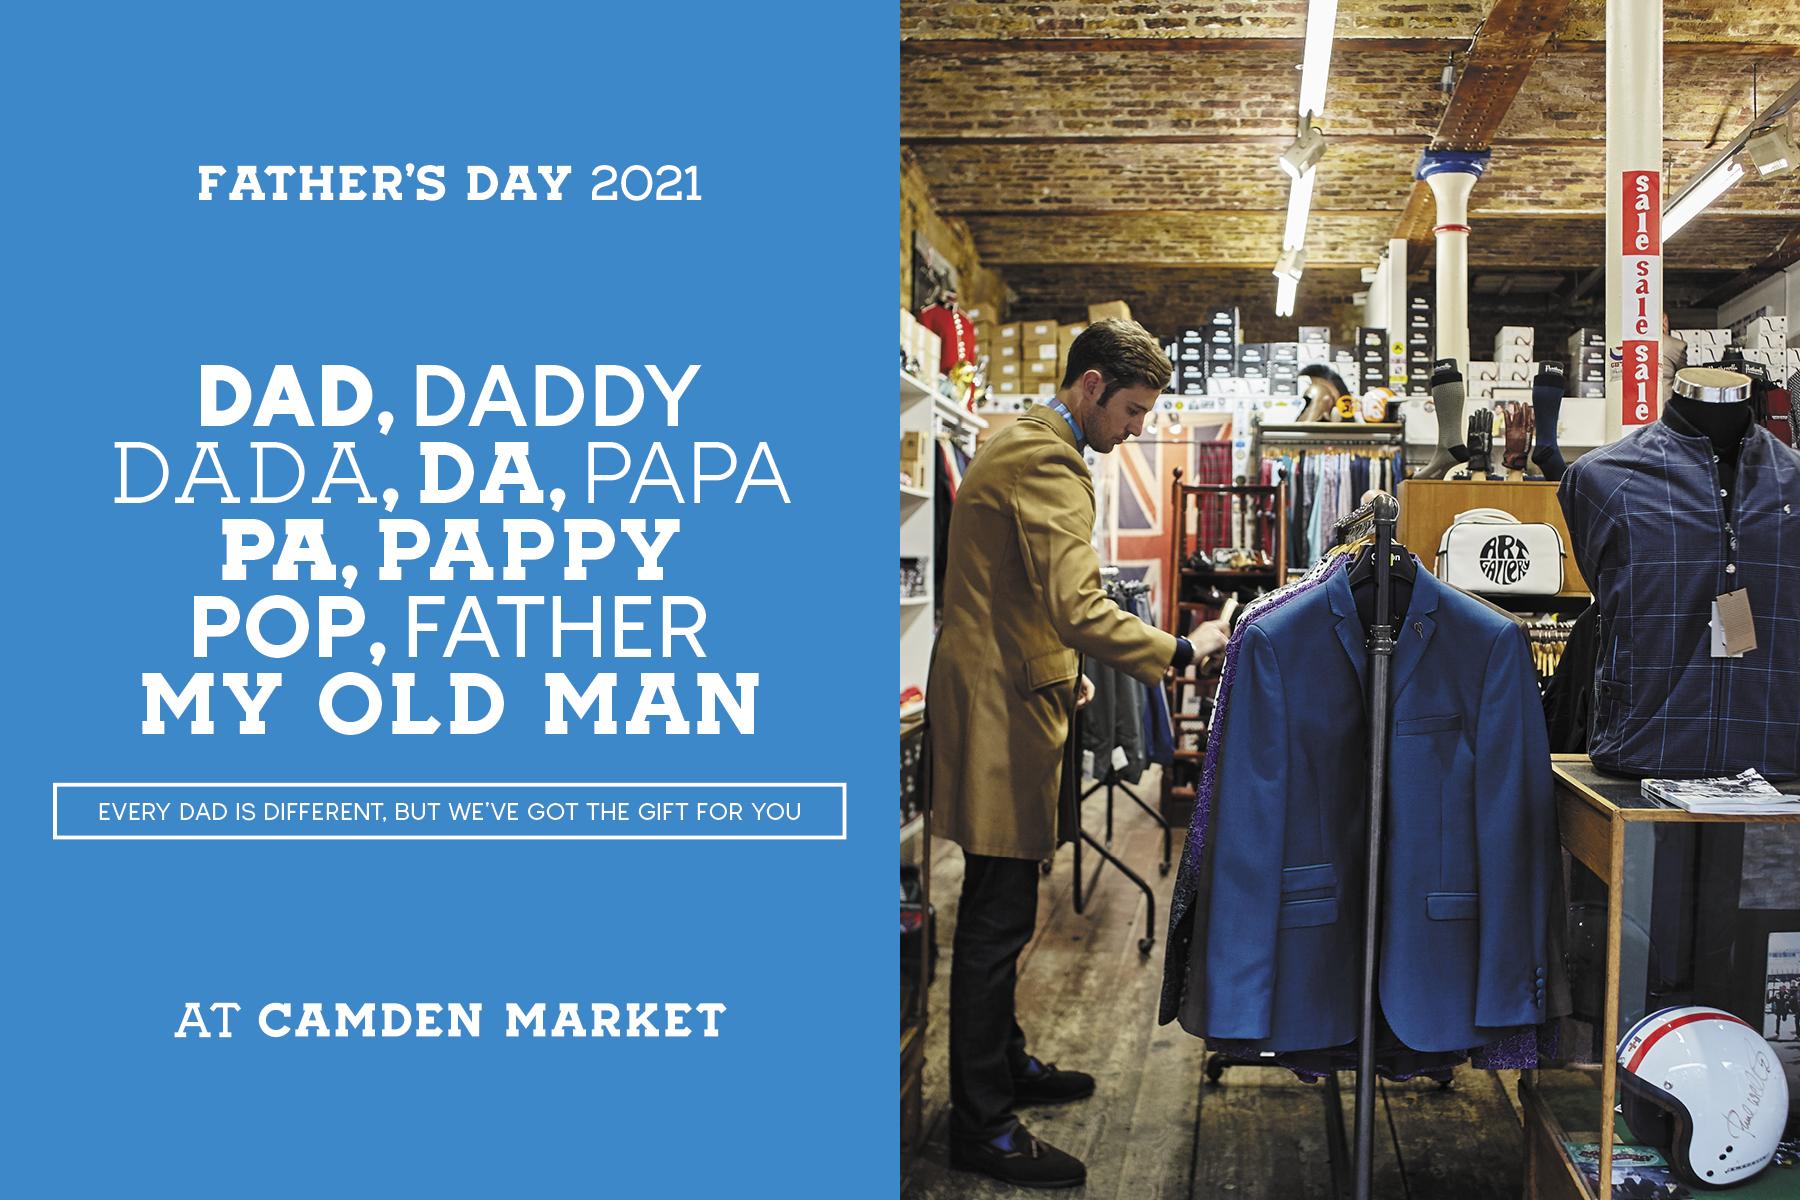 CM-Fathers-Day-2021-hero-desktop_CM-website_2021_v1